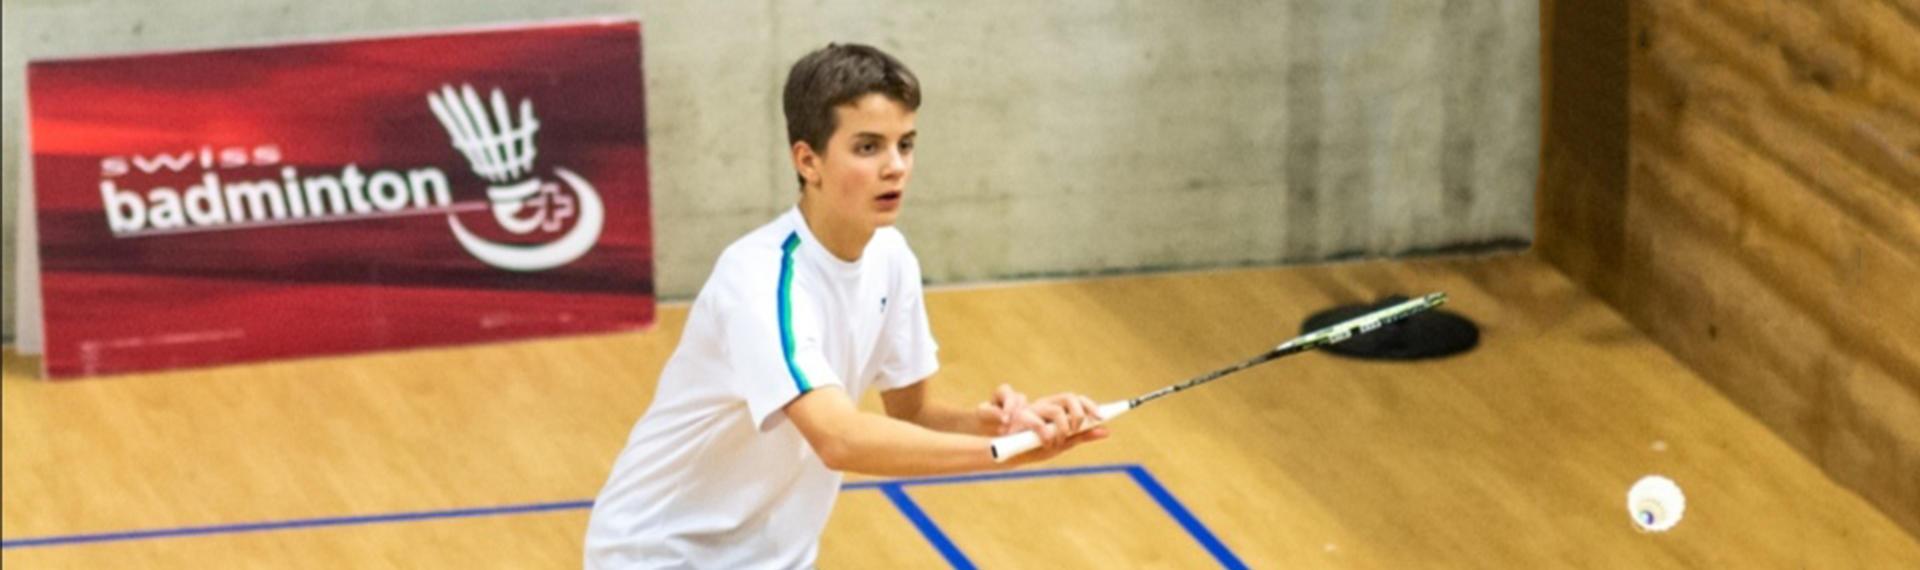 Nicolas Franconville, badminton: private bank Bonhôte